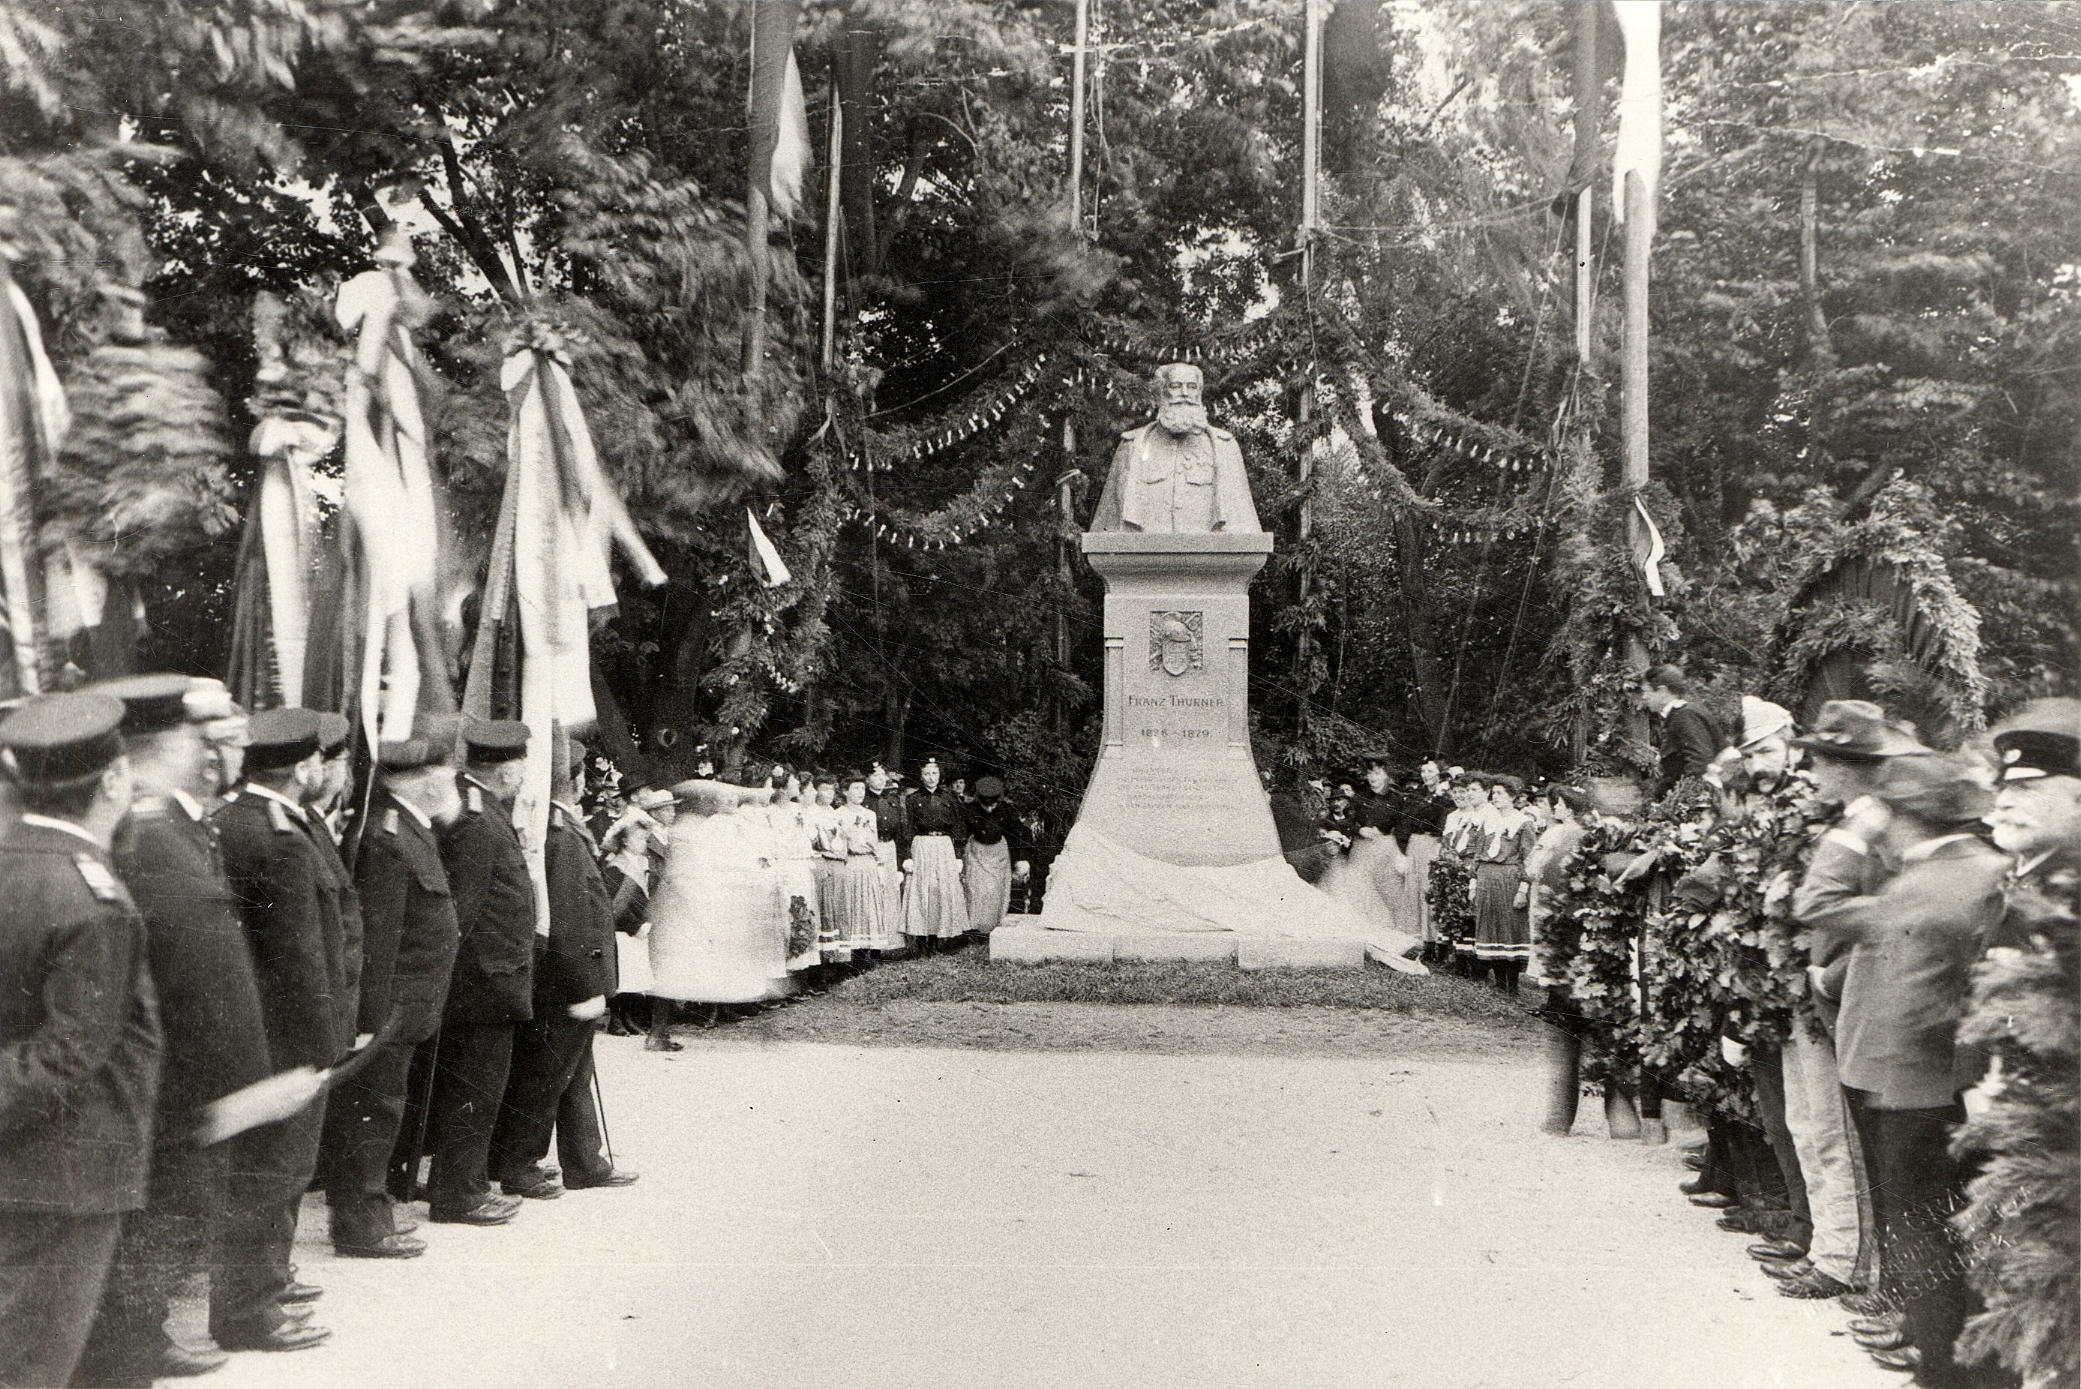 Das Thurner-Denkmal Im Waltherpark